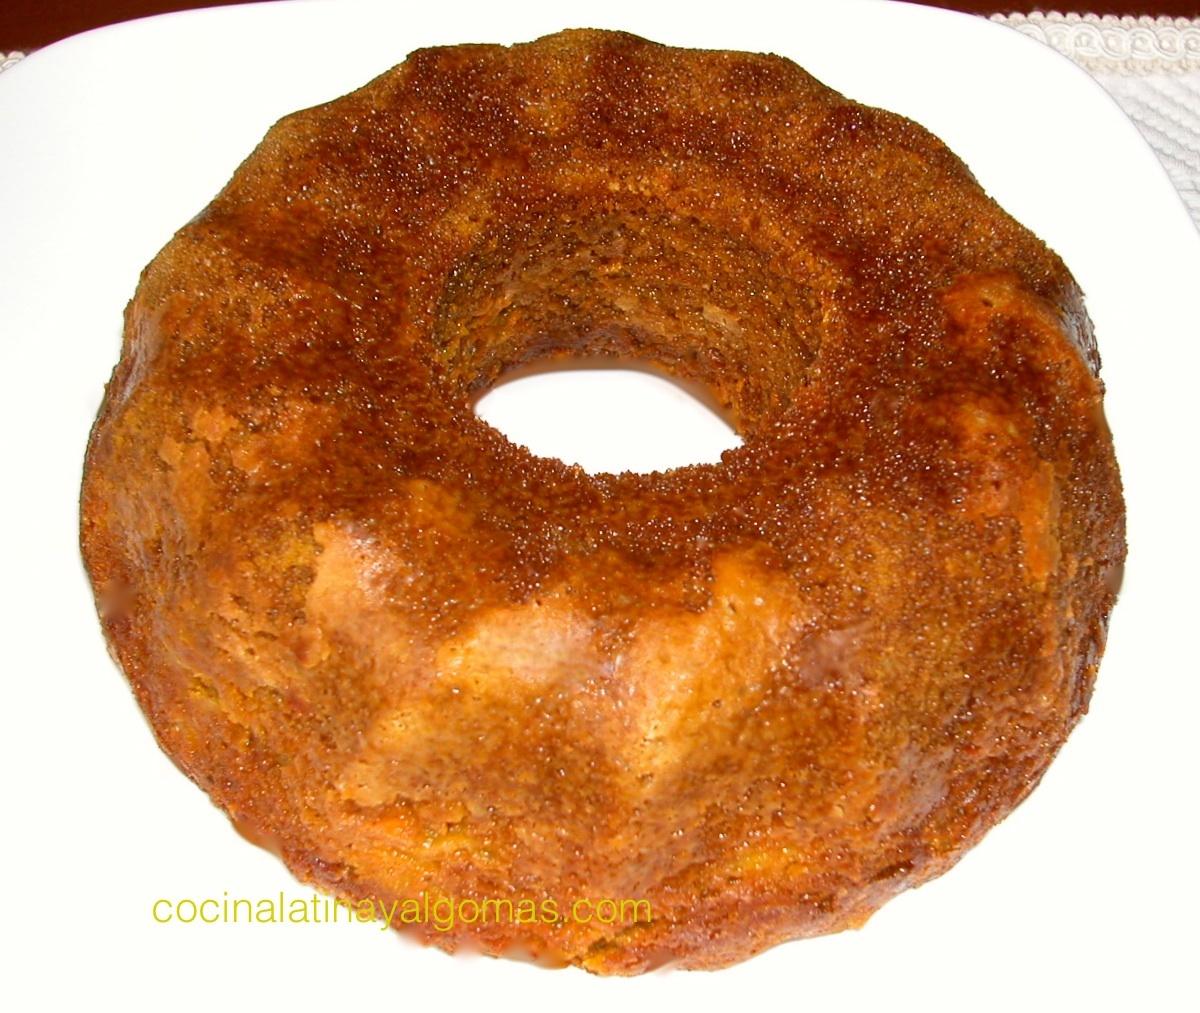 torta 1 2 3 4 sin crema en microondas